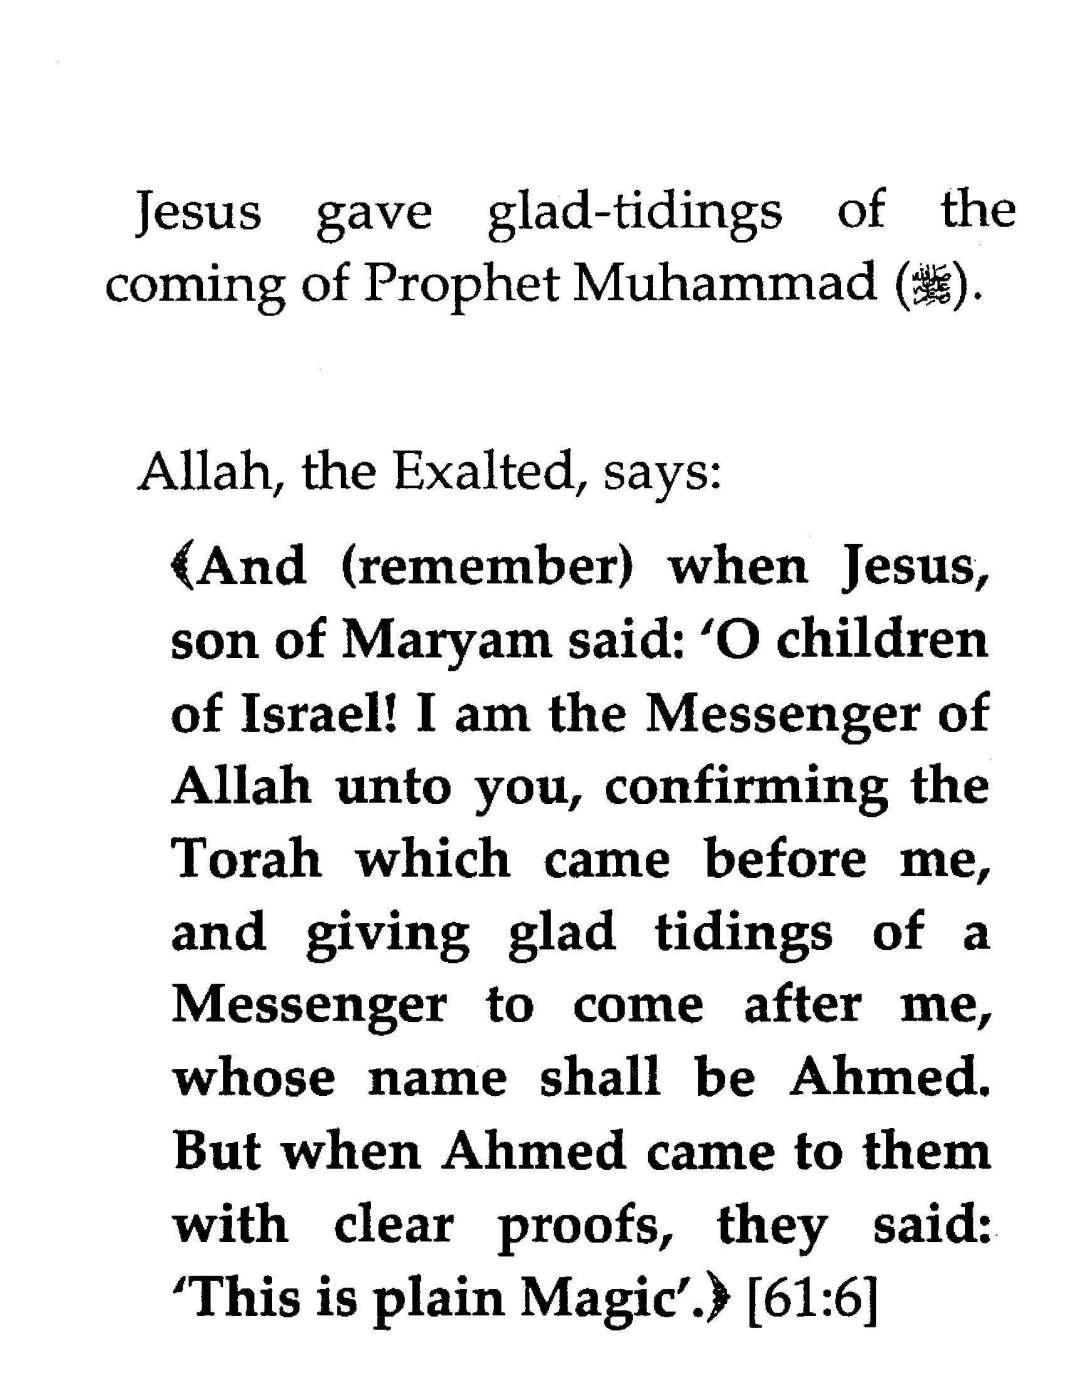 MuhammadpeaceBeUponHimInTheTorahAndGospel_Page_11